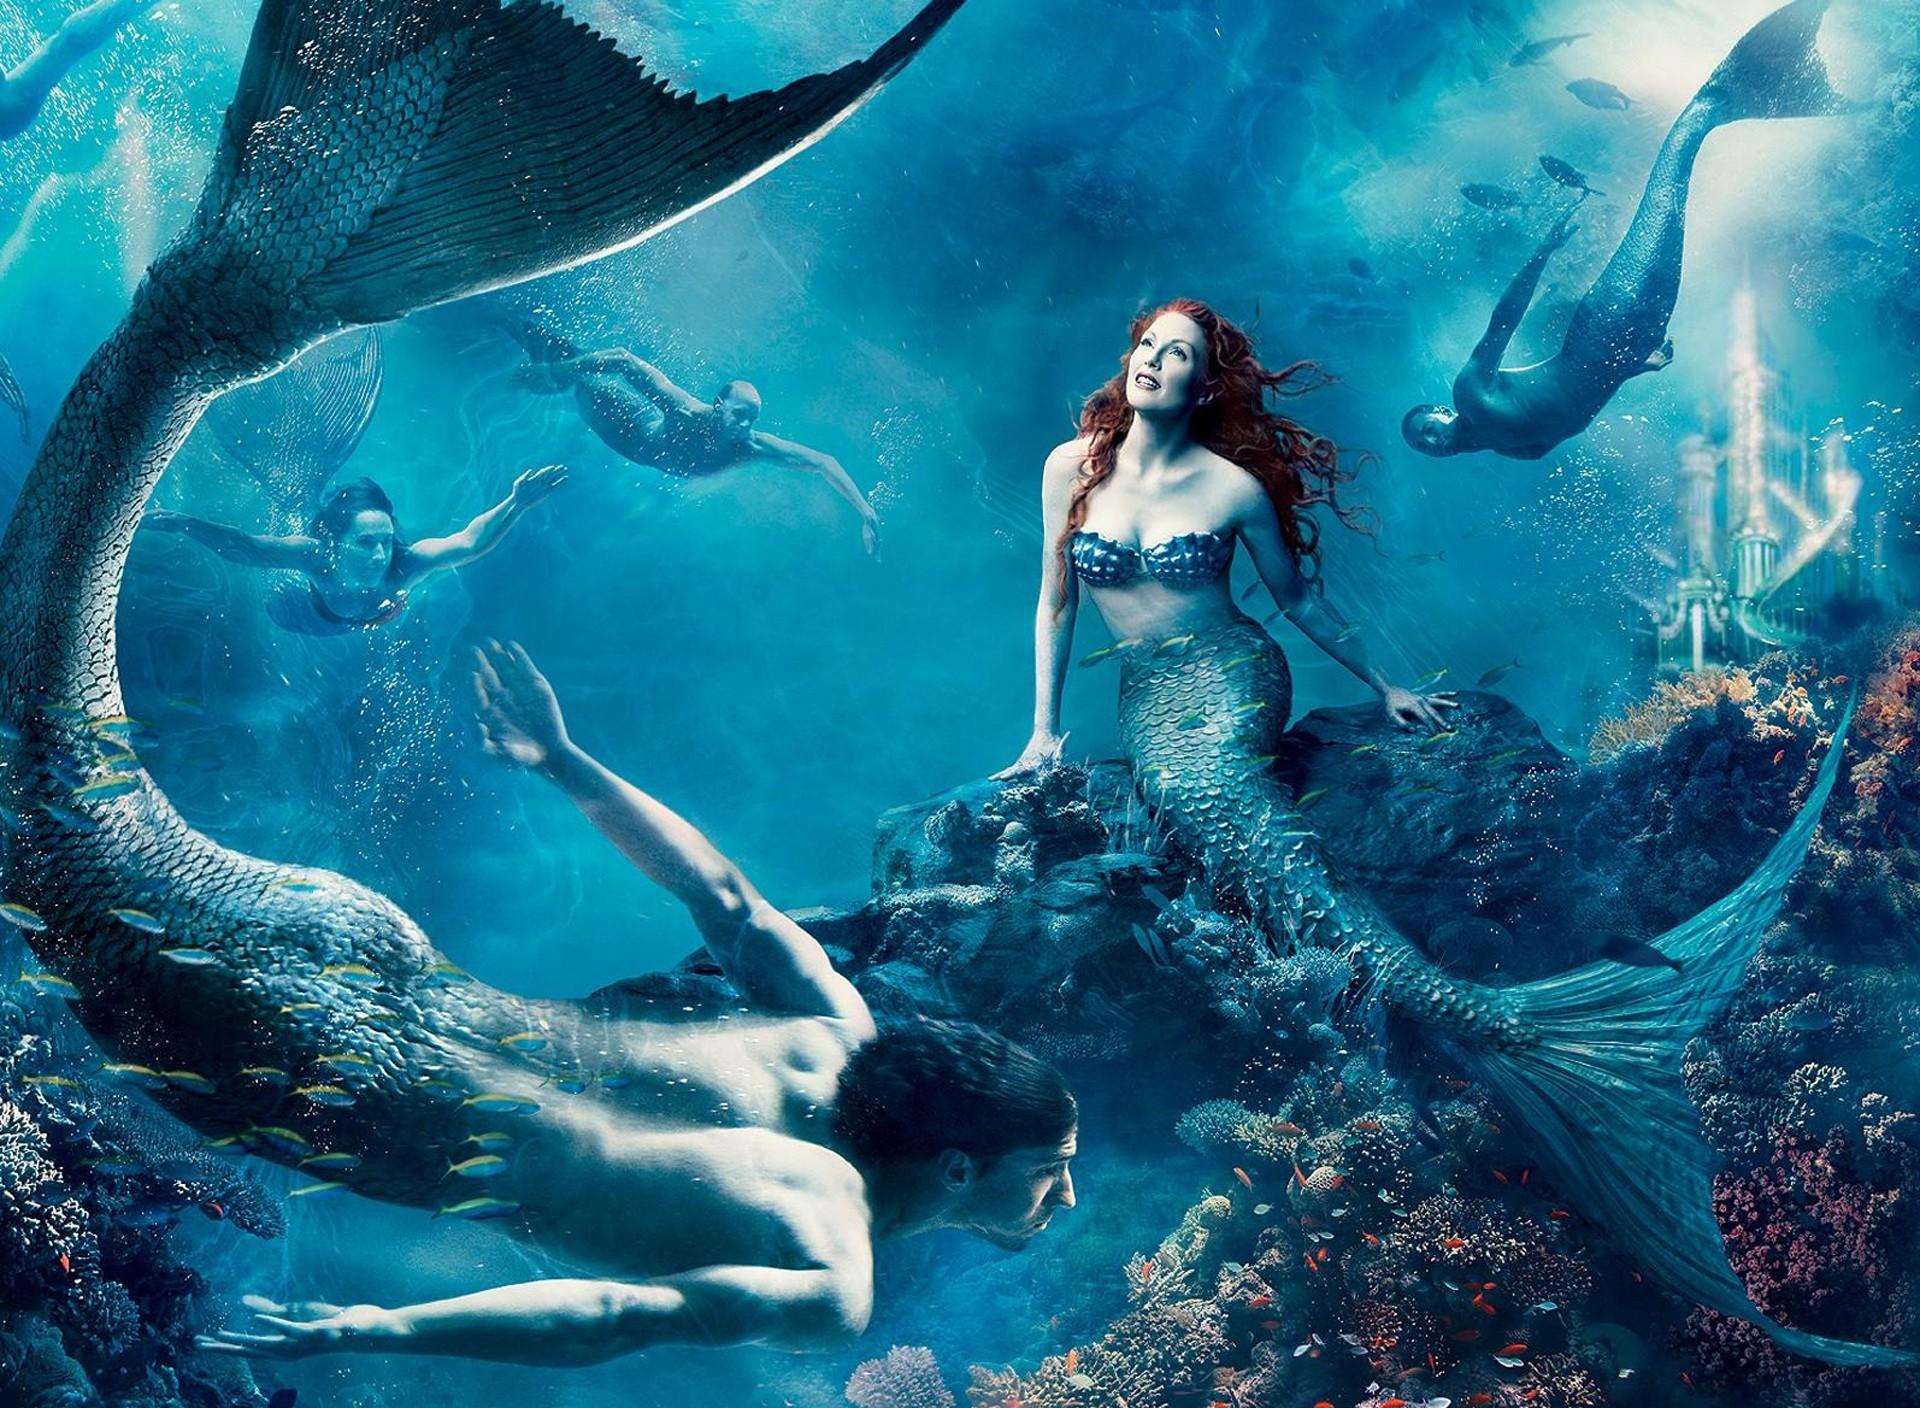 Little Mermaid free Screensaver wallpaper